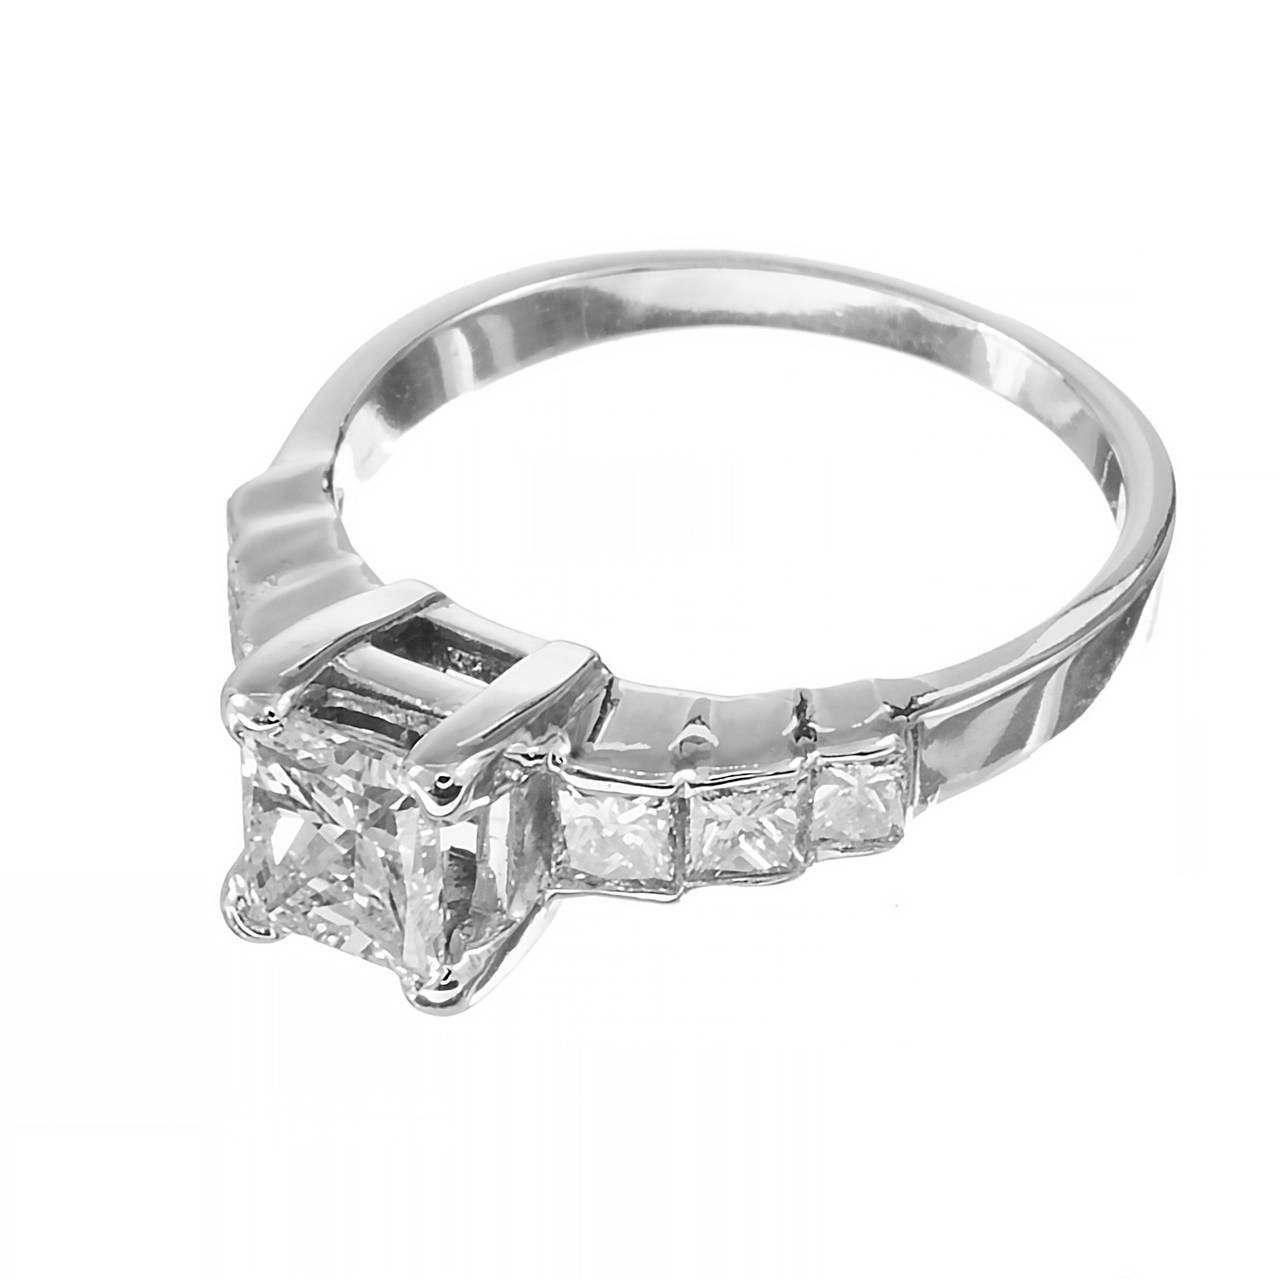 Very nice well designed simple Princess cut diamond engagement ring with graduated Princess cut side diamonds. crt  1 rectangular diamond, approx. total weight .75cts, VS2, 6 square Princess cut diamonds, approx. total weight .45cts, F – G, VS –